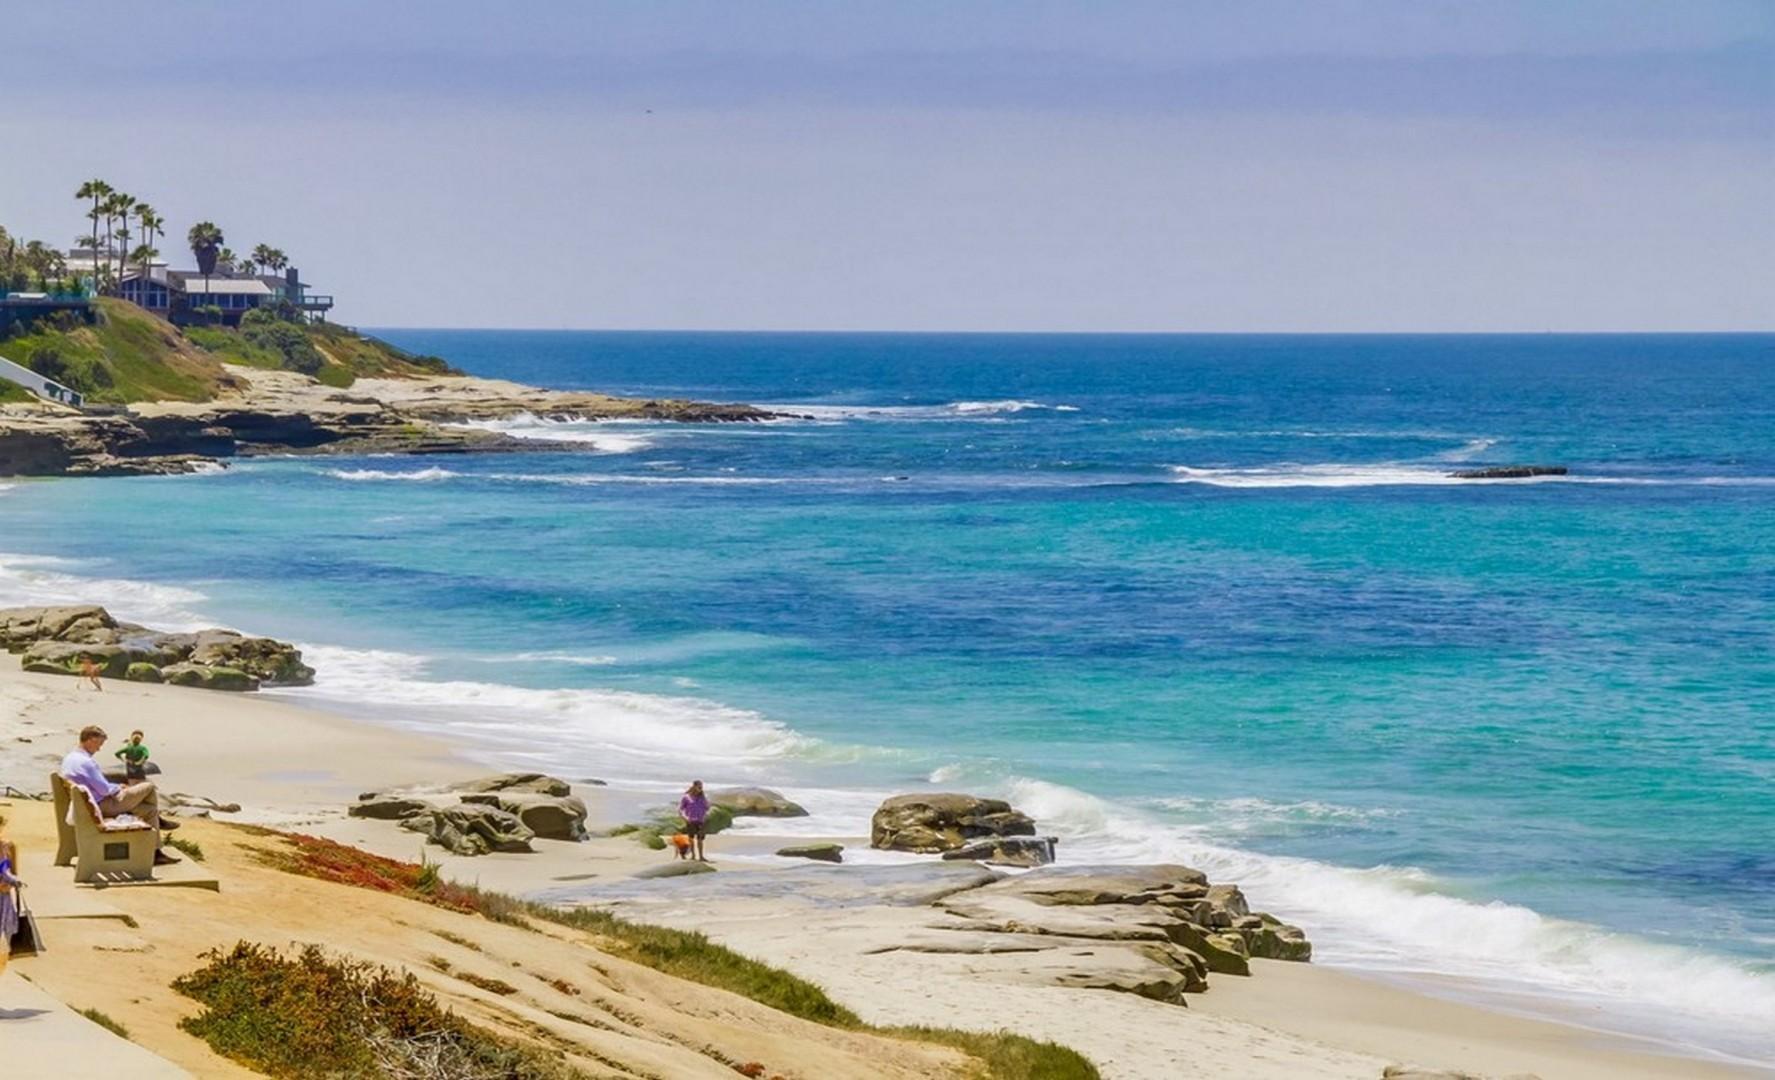 Picturesque Windansea beach in La Jolla